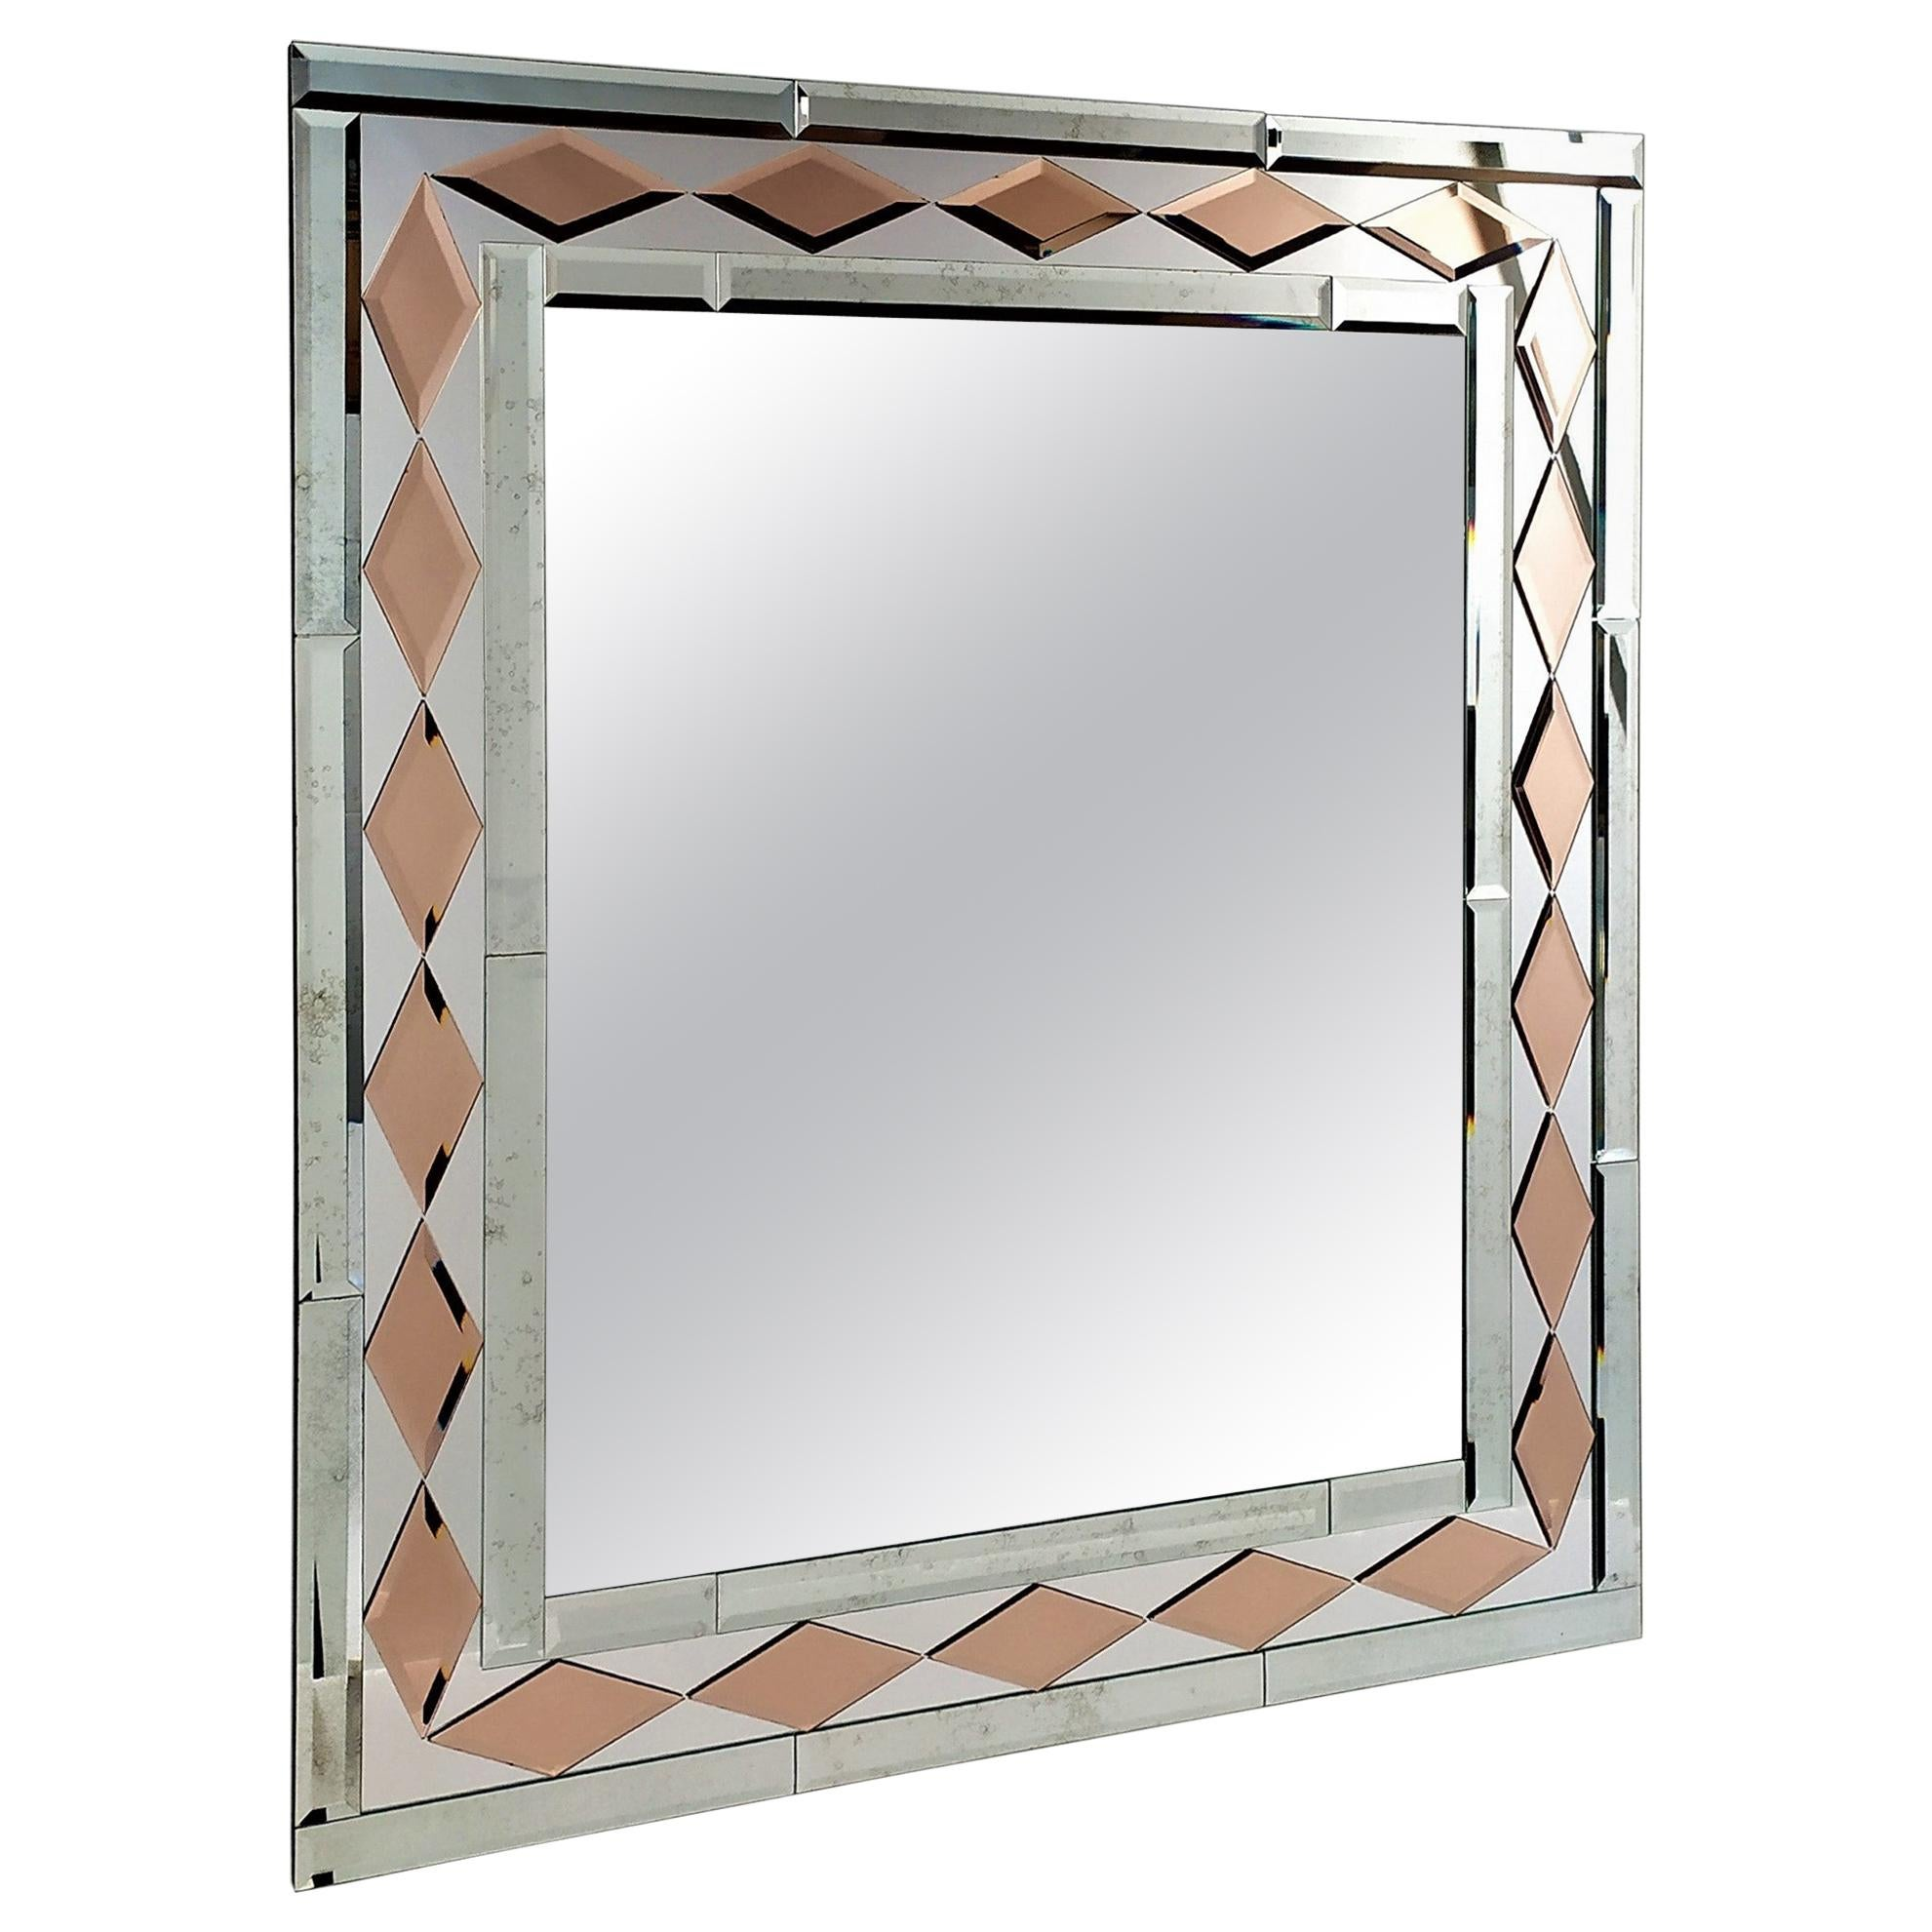 Pink Diamonds, Murano Glass Contemporary Mirror, by Fratelli Tosi